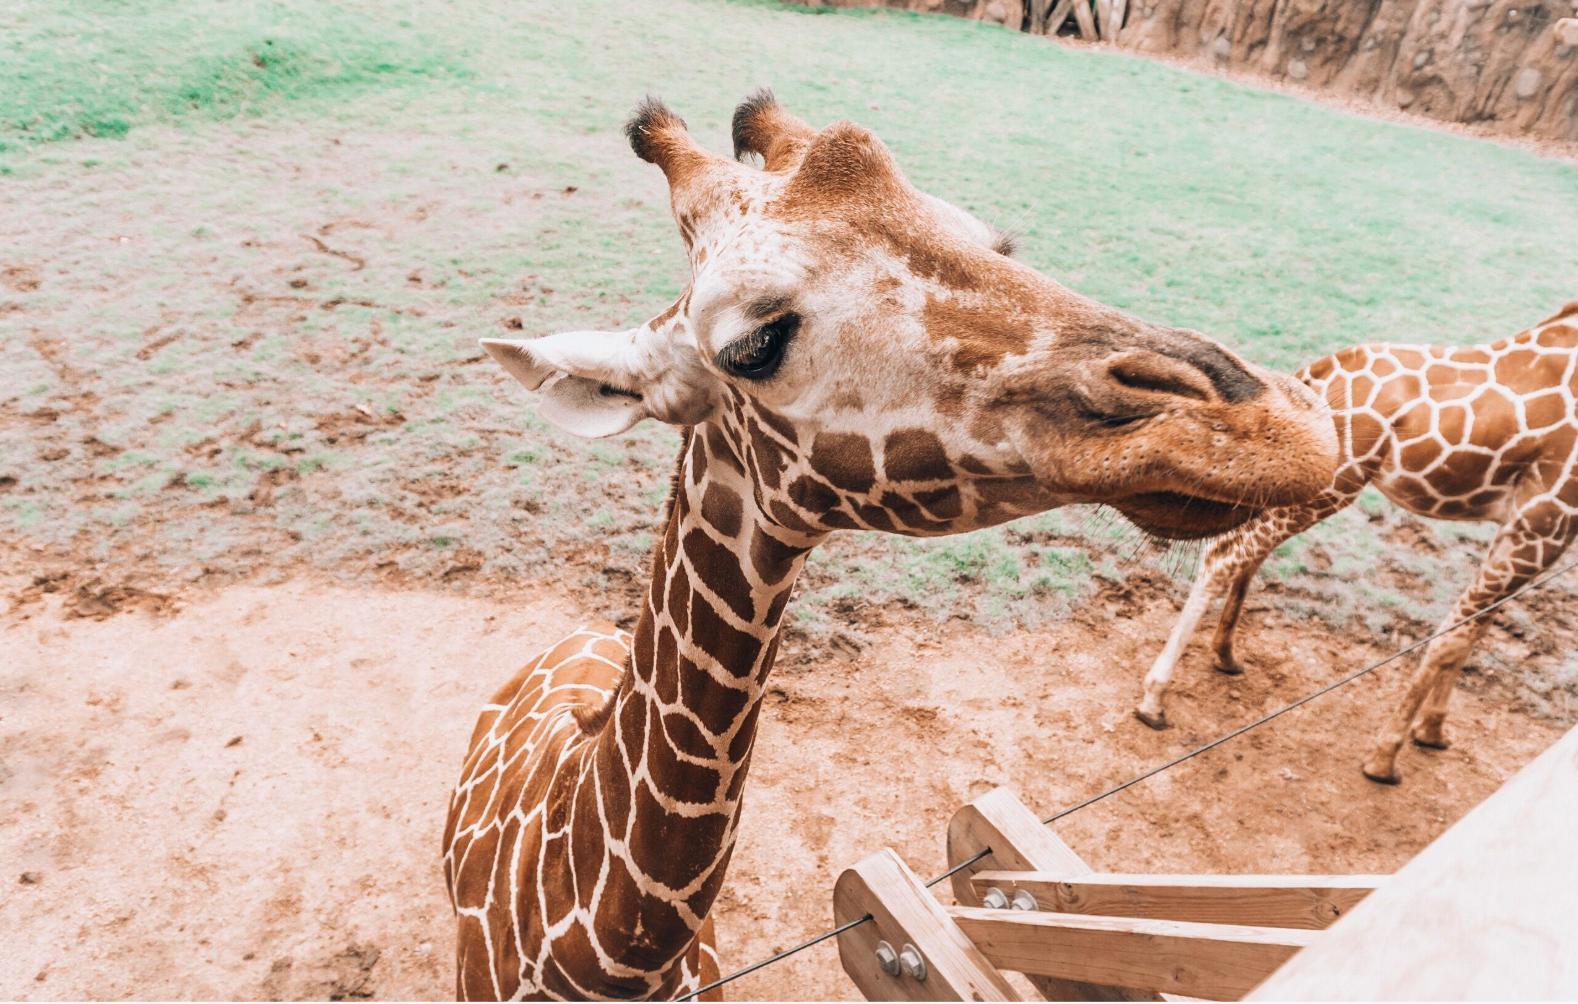 fort worth zoo giraffe.png